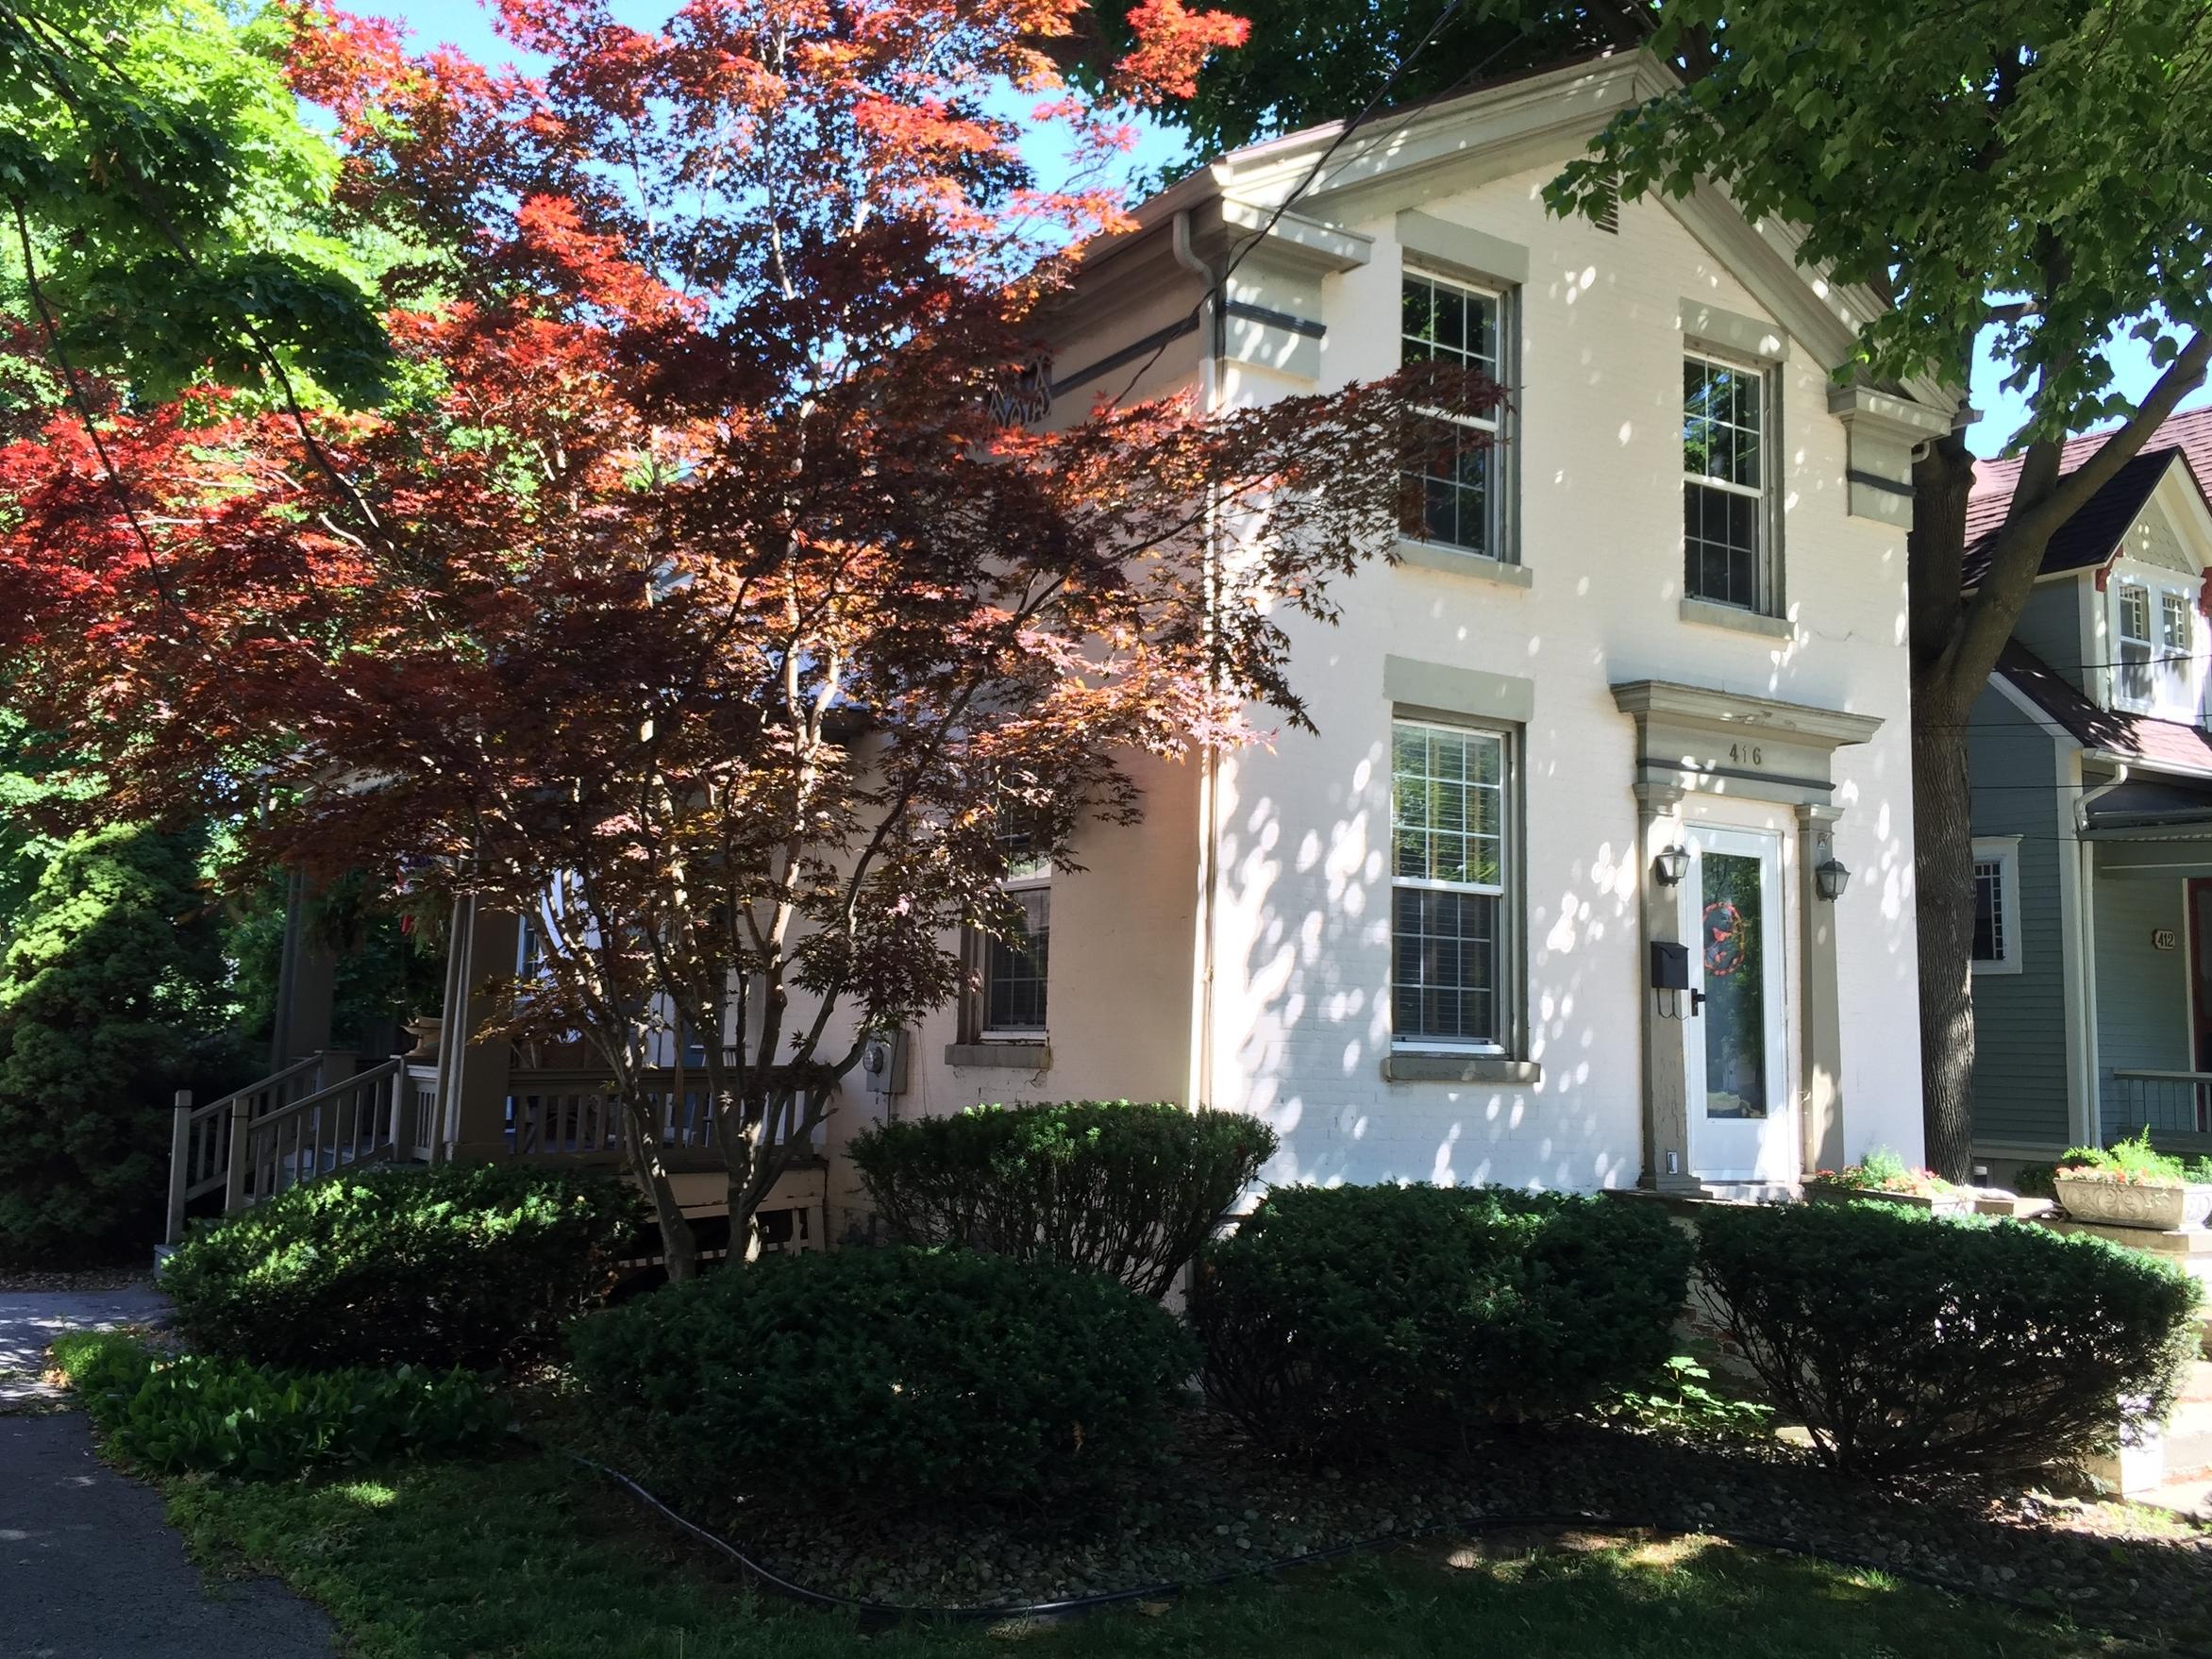 Marvin Thompson House, 416 North Broad Street, 1849